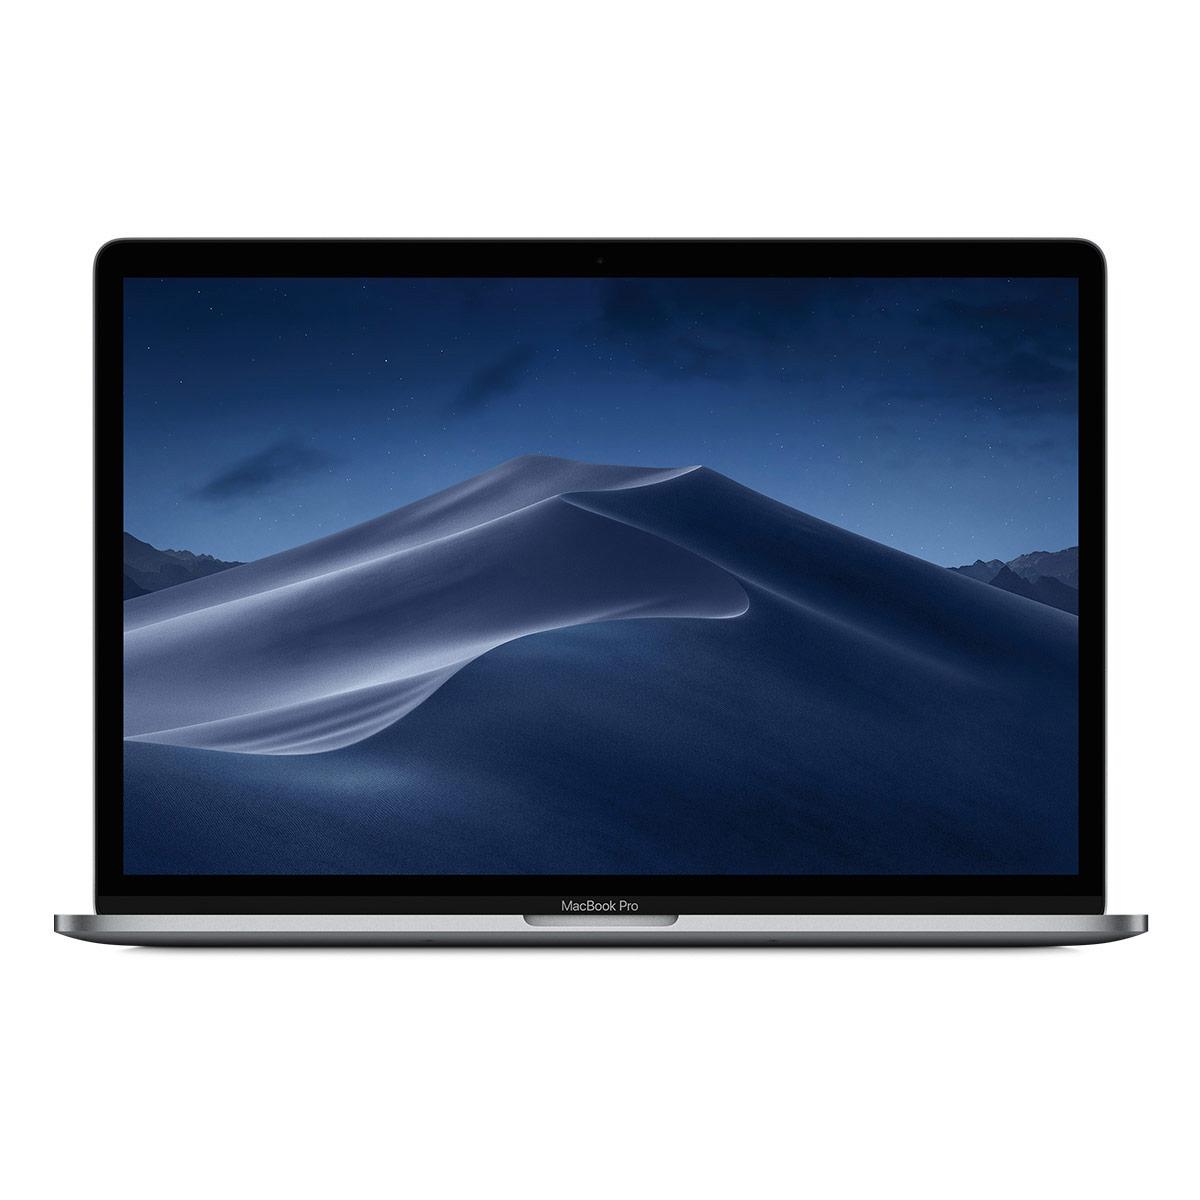 "MacBook Pro 15"" TouchBar 8-core i9 2.4GHz 32GB 1TB 560X Space Grey"